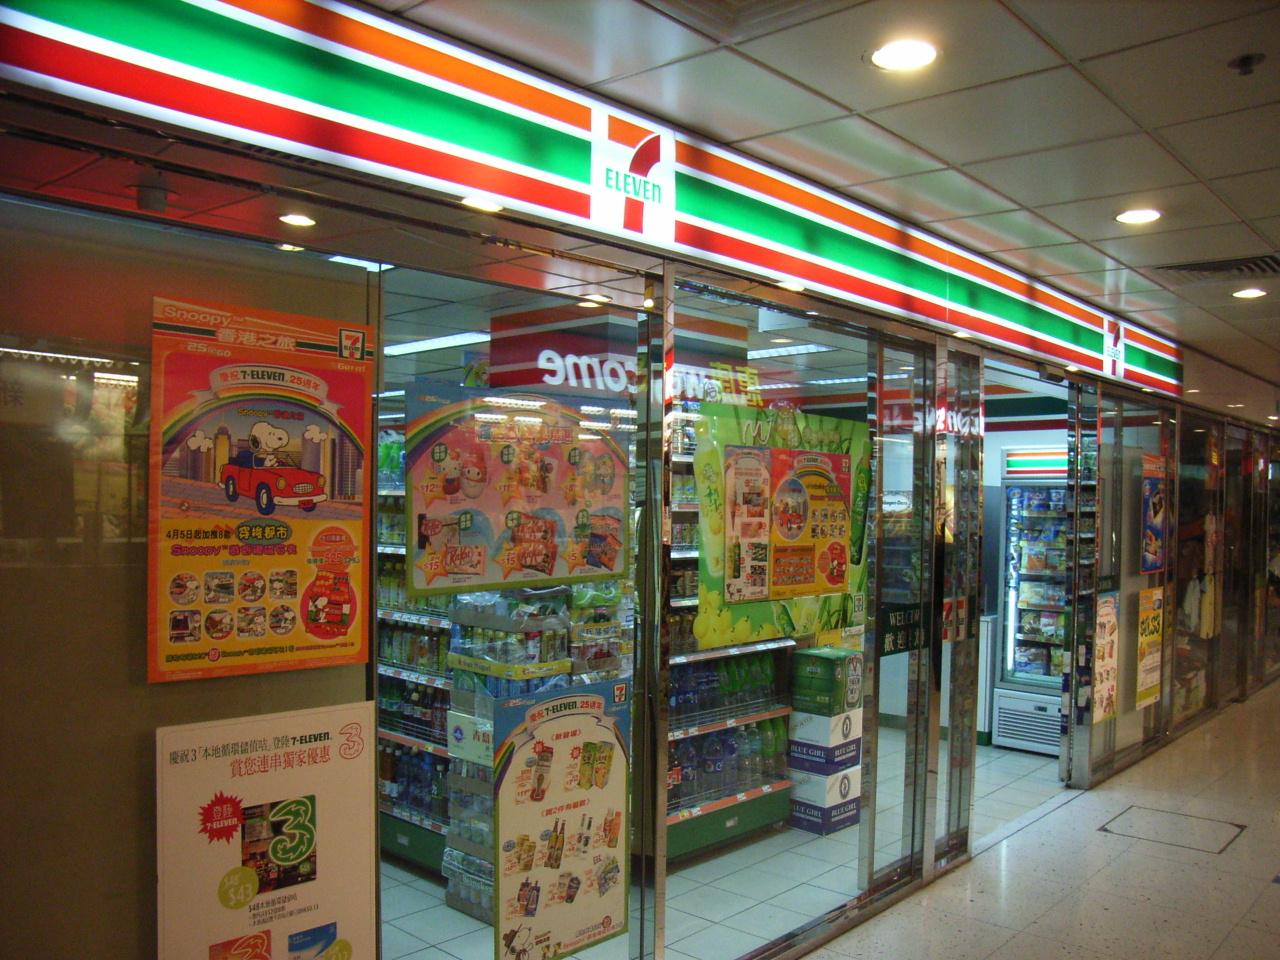 HK_SYP_Chong_Yip_Ctr_7-11_shop.jpg